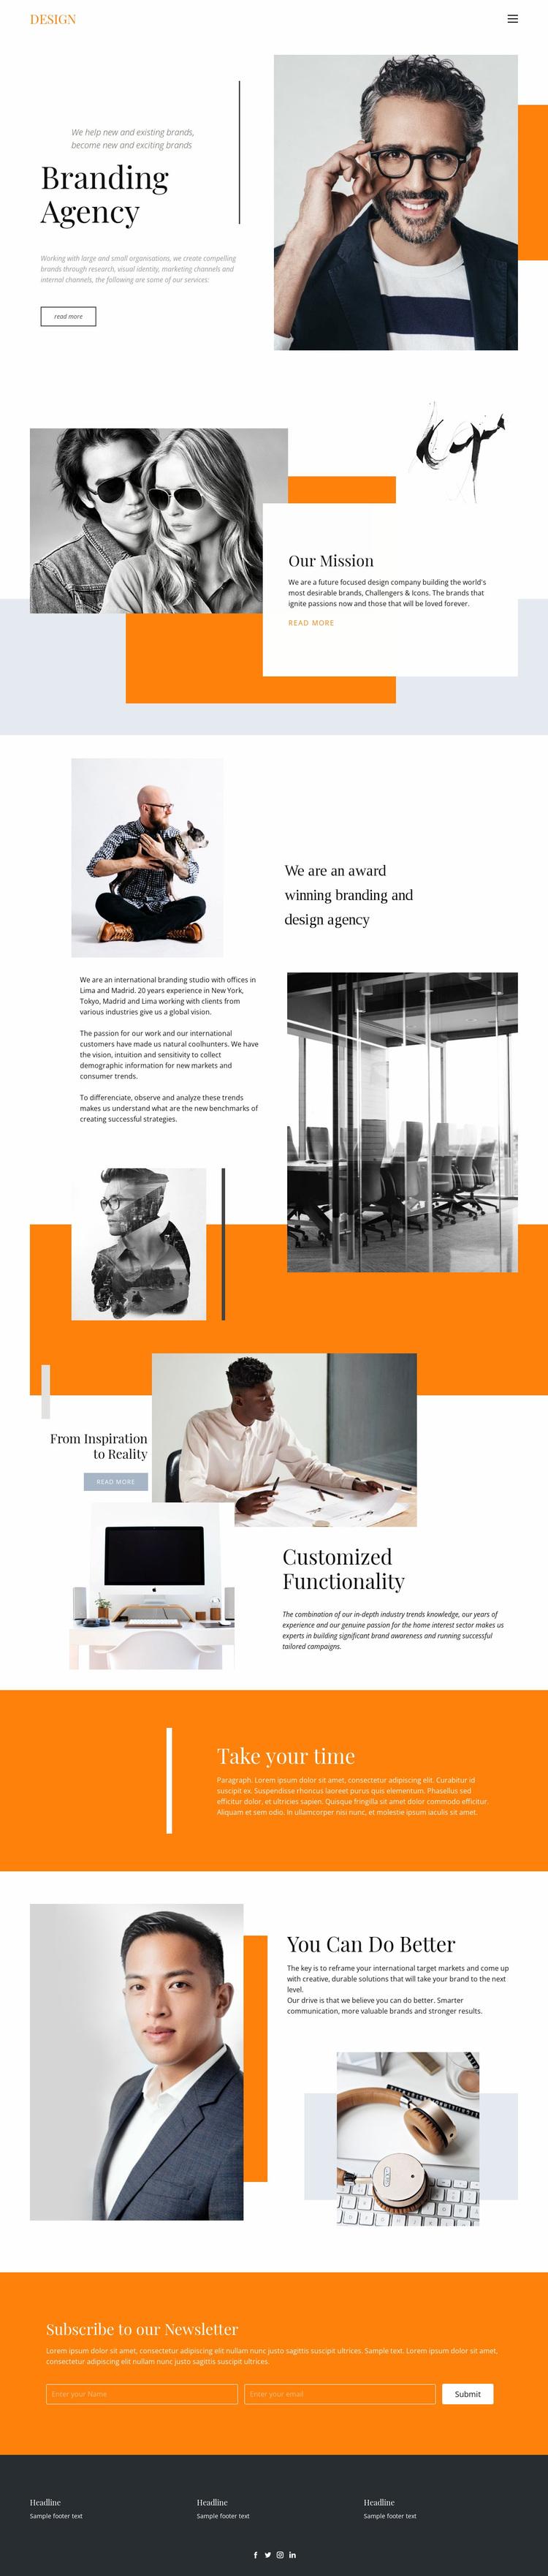 Exiting agency business Website Design